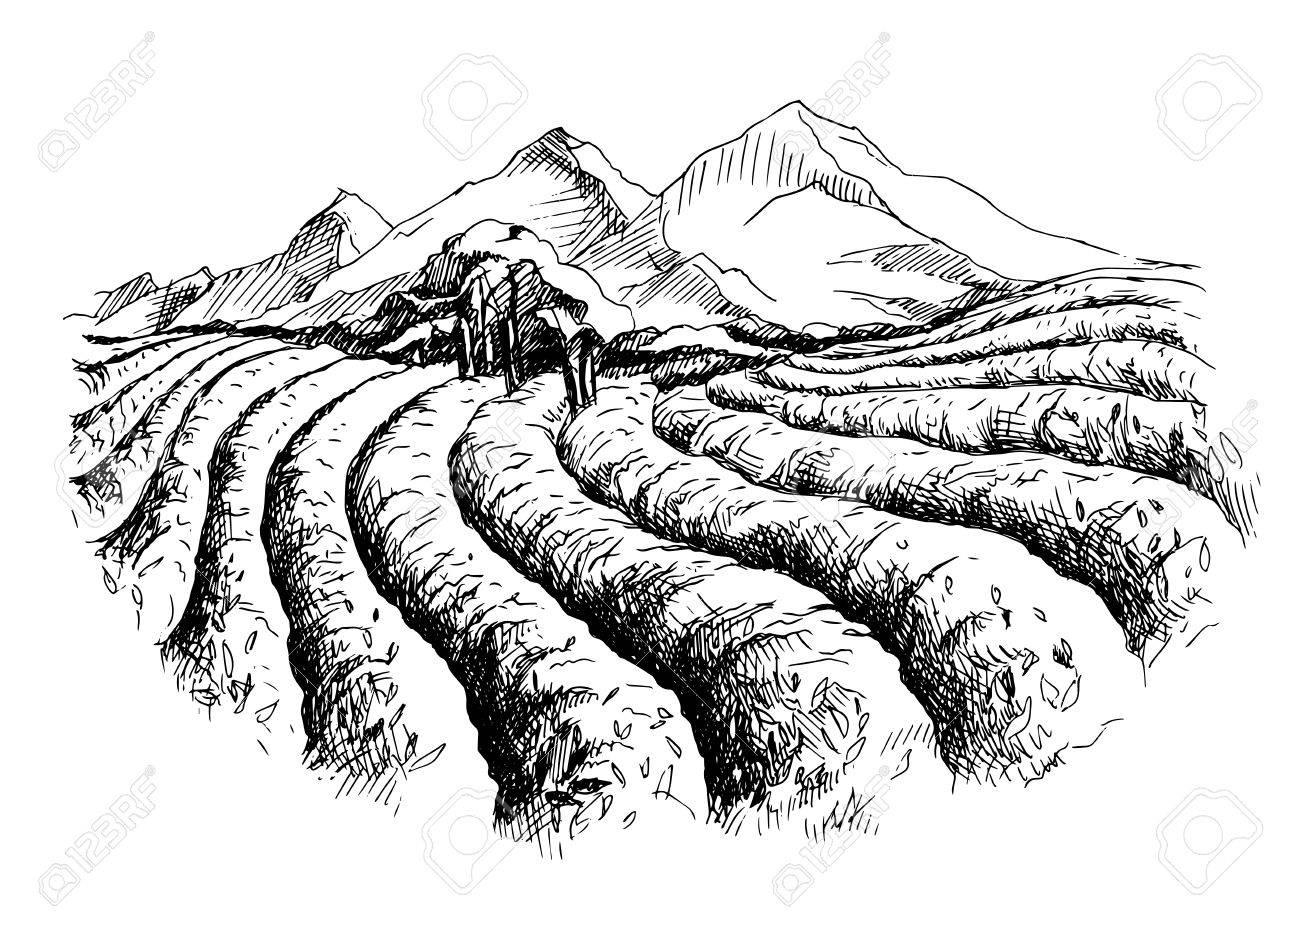 Tea plantation landscape in graphic style, hand-drawn vector illustration. - 73446544